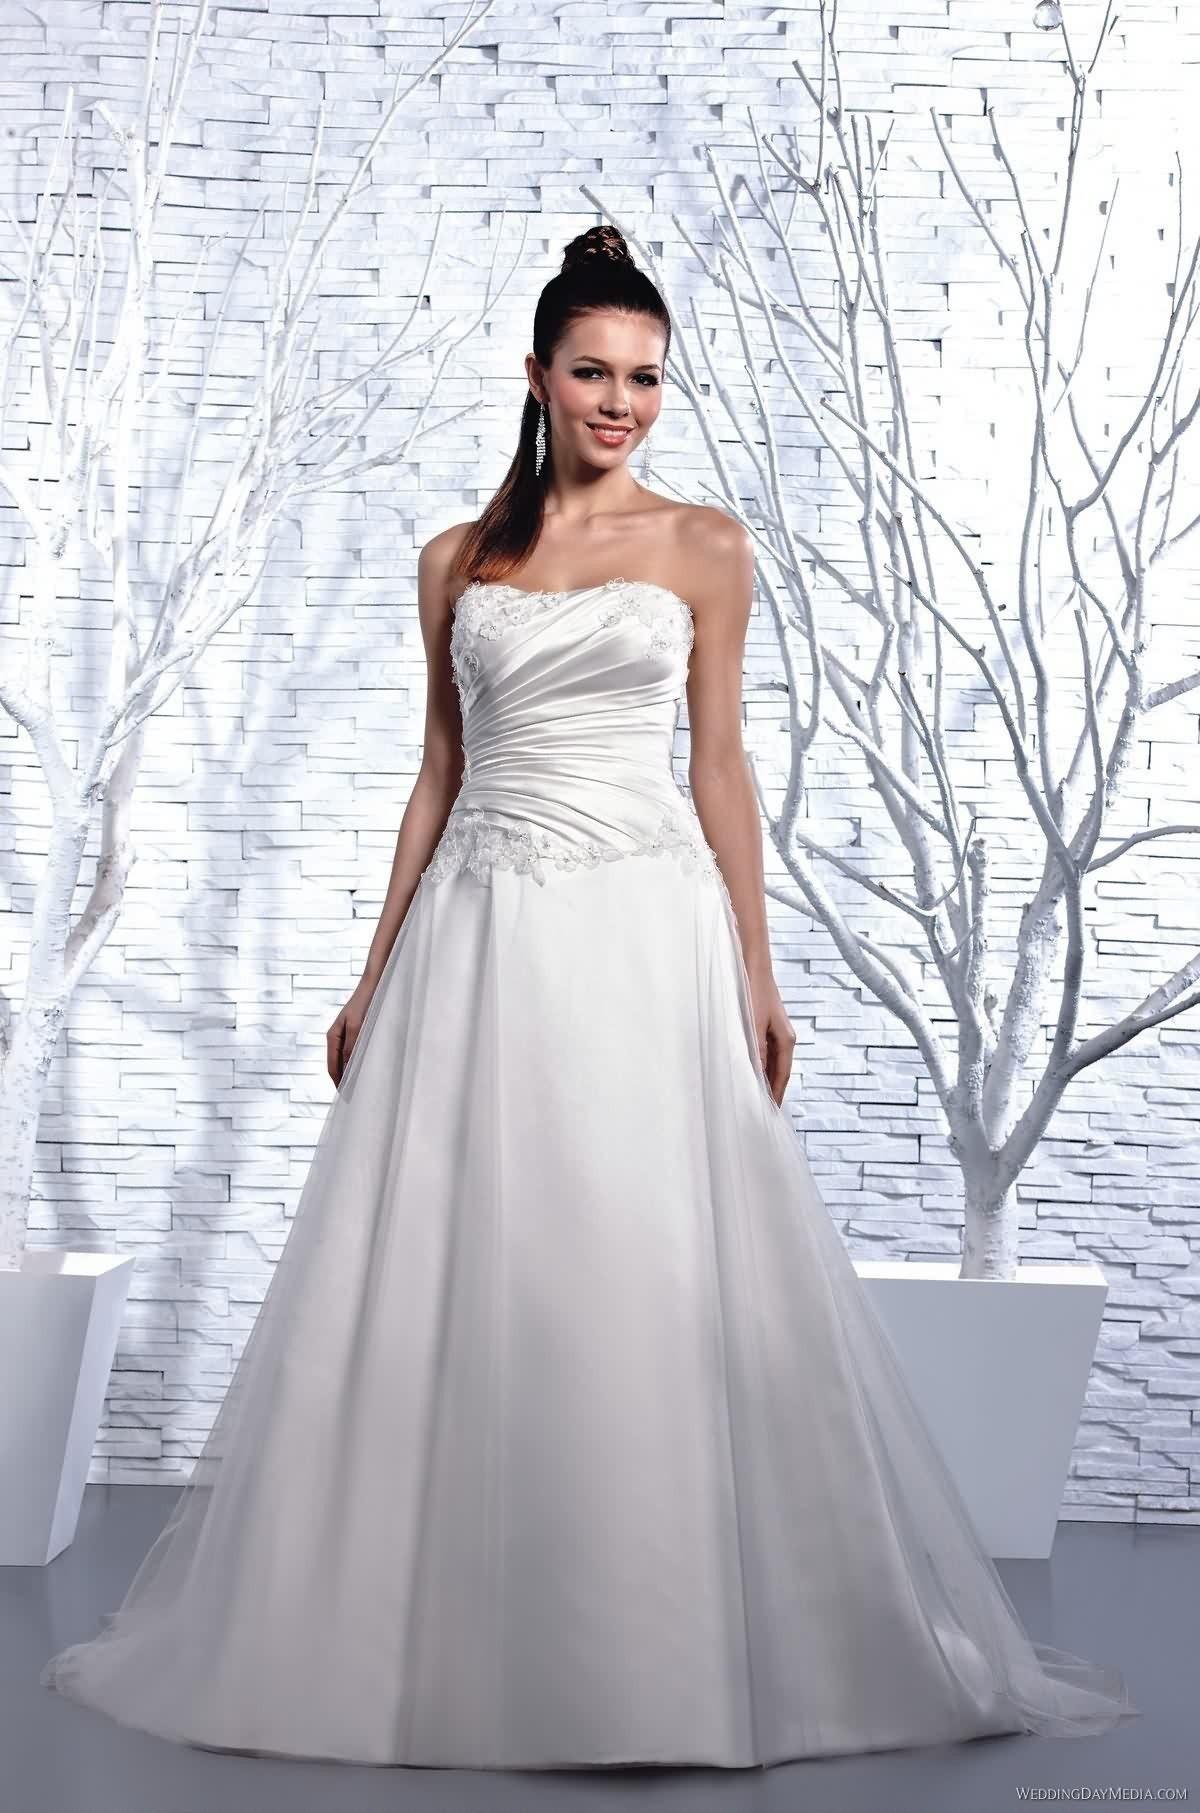 D Zage D31203 Wedding Dresses 2017 238 55